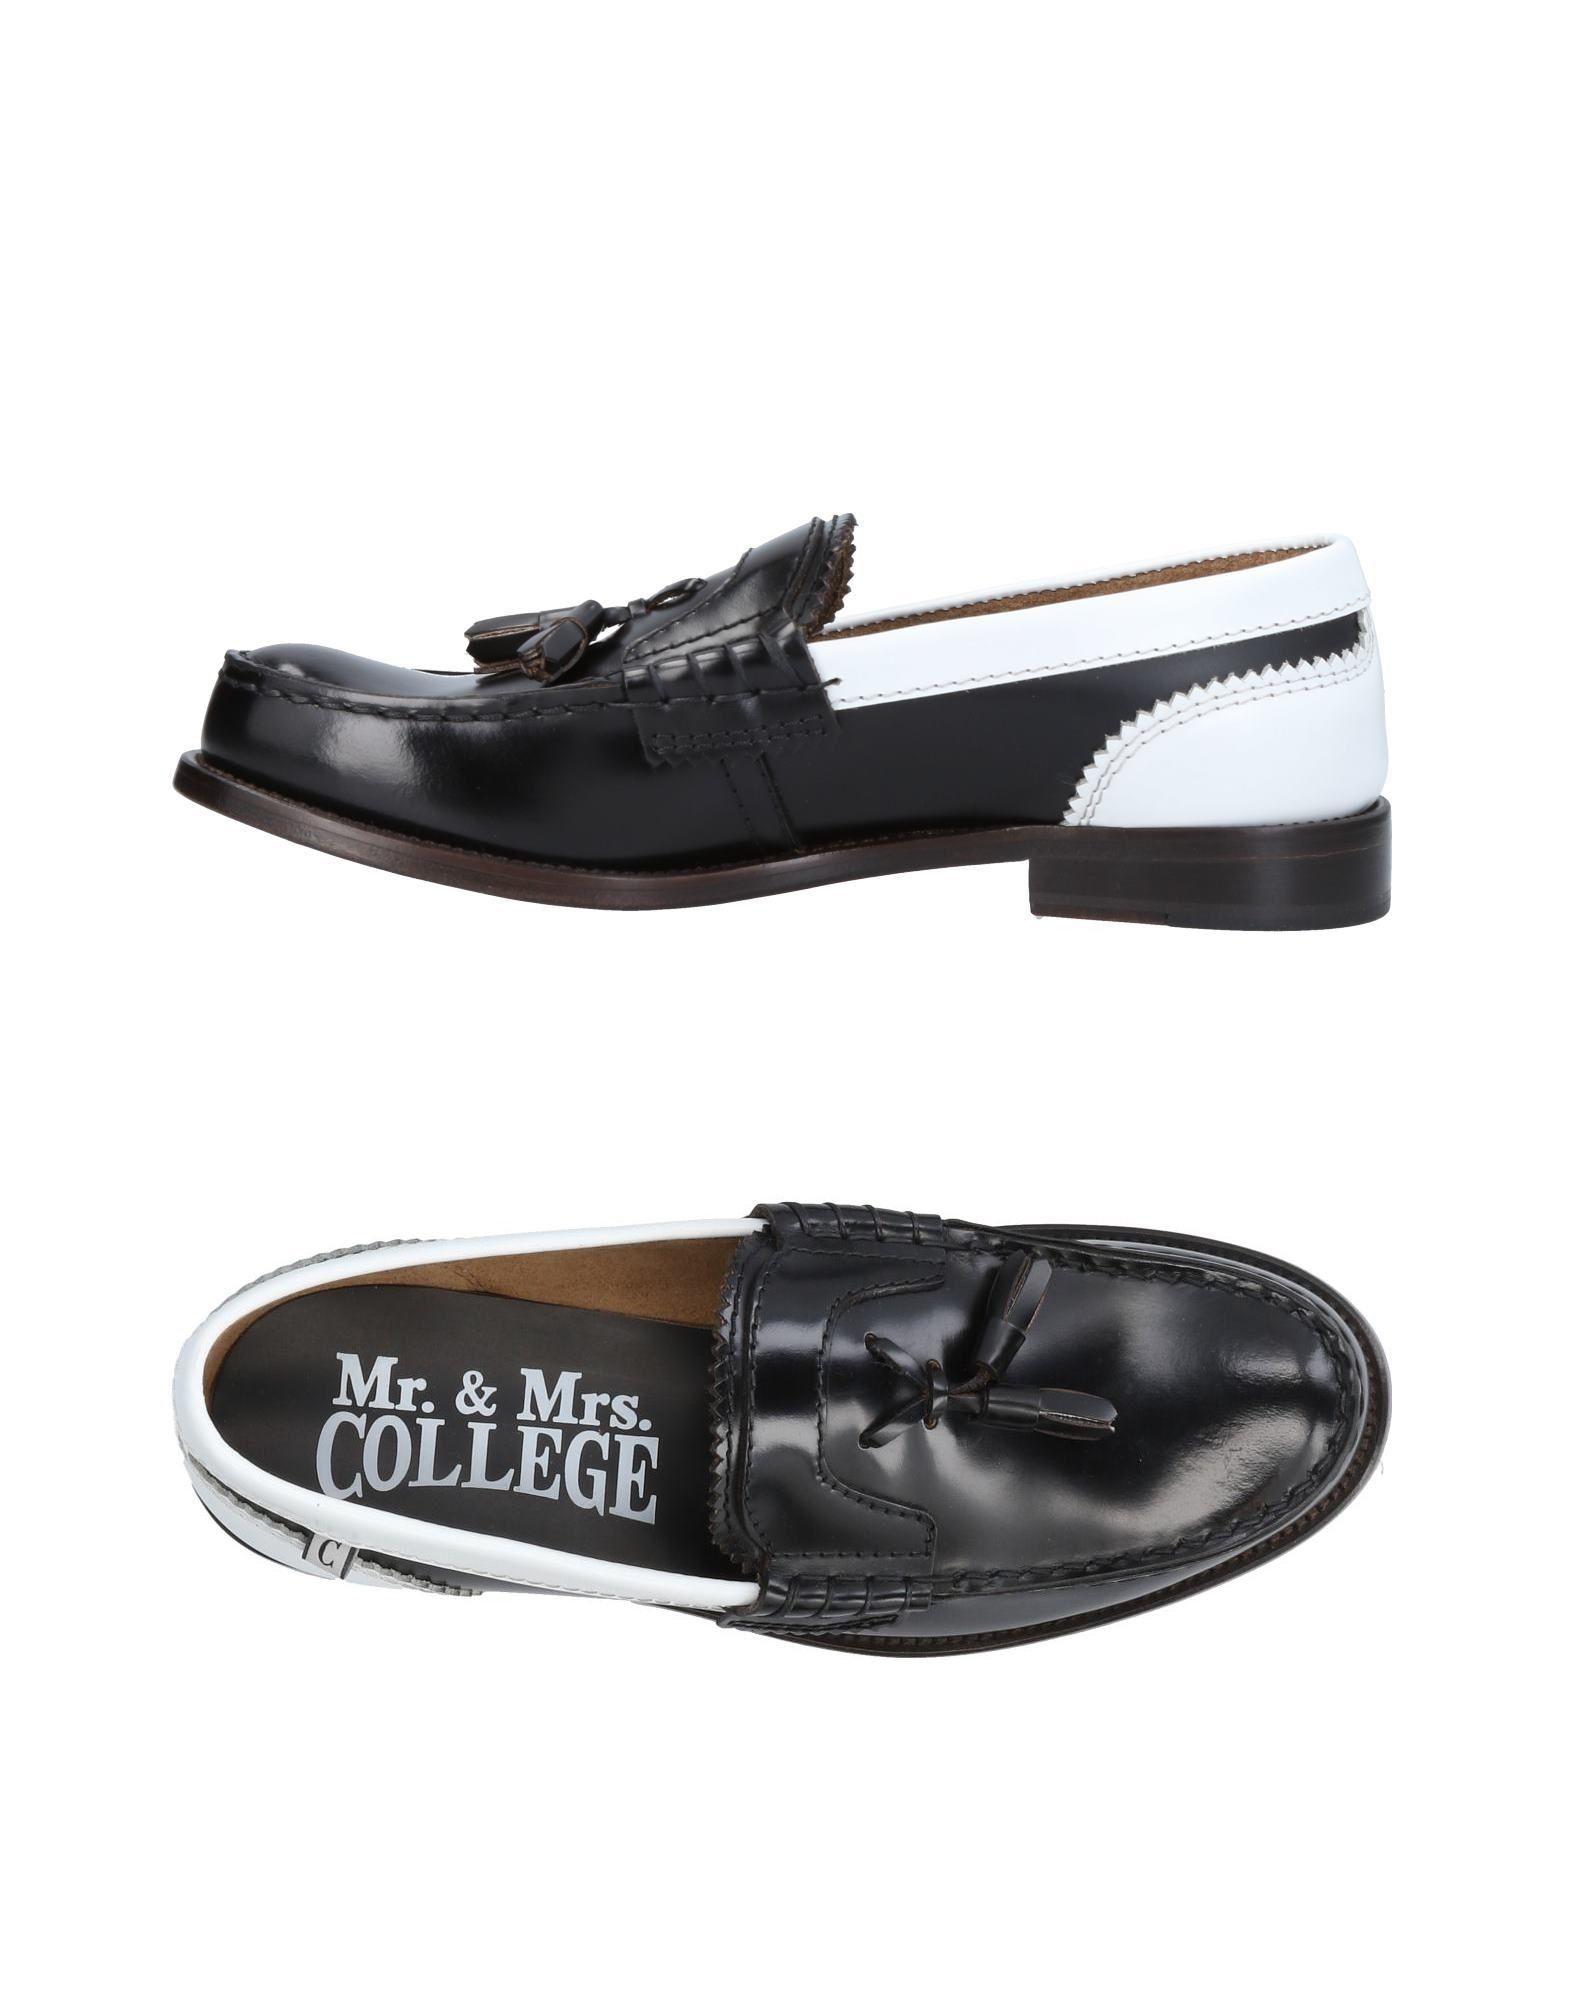 Mr. & Mrs. College Mokassins Damen beliebte  11428485MM Gute Qualität beliebte Damen Schuhe ed3ec7